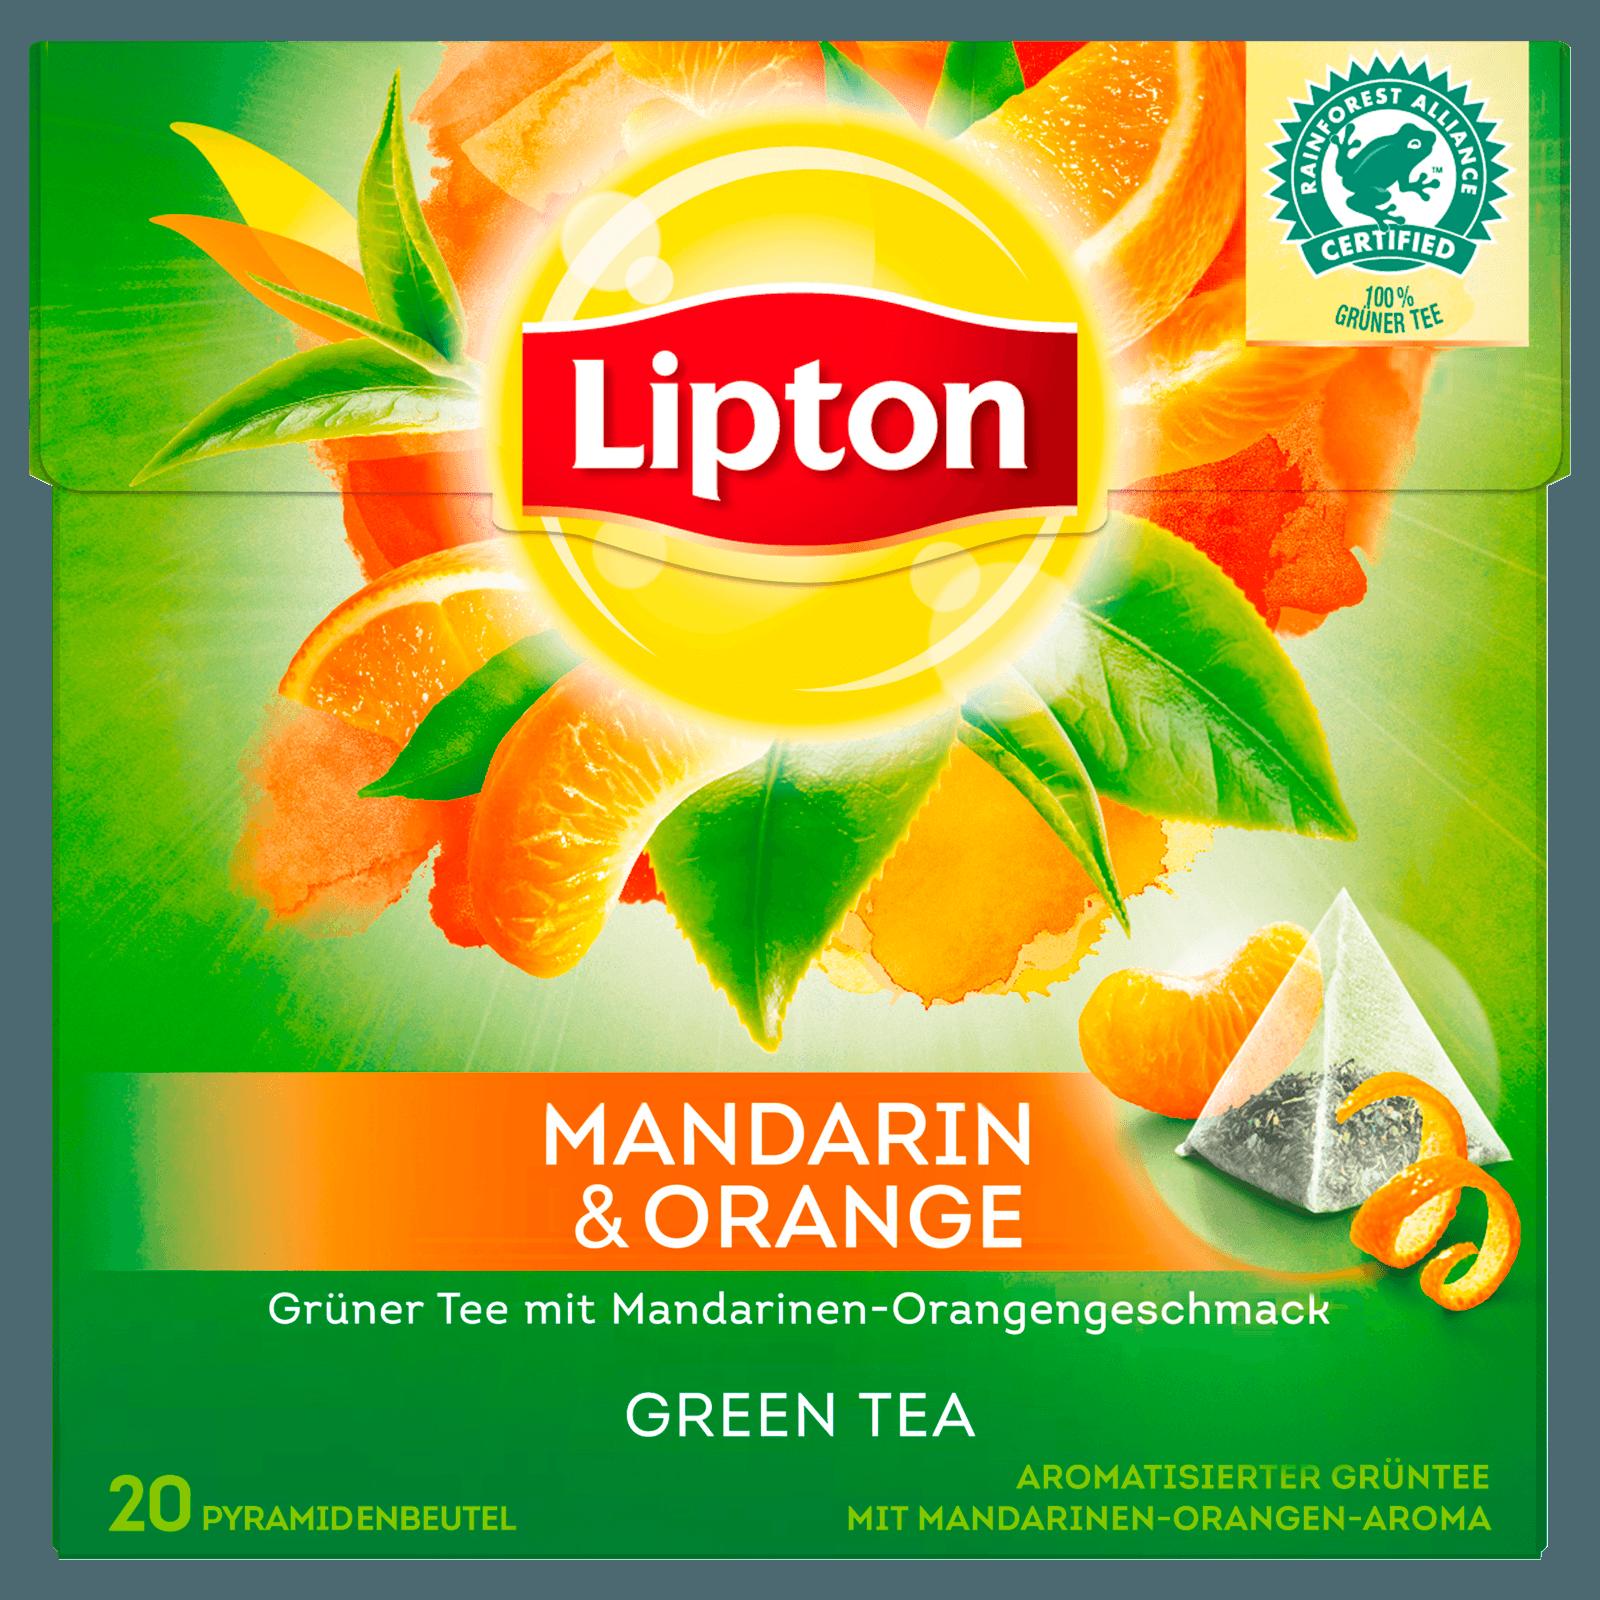 Lipton Grüner Tee Mandarine Orange Pyramidenbeutel 36g, 20 Stück